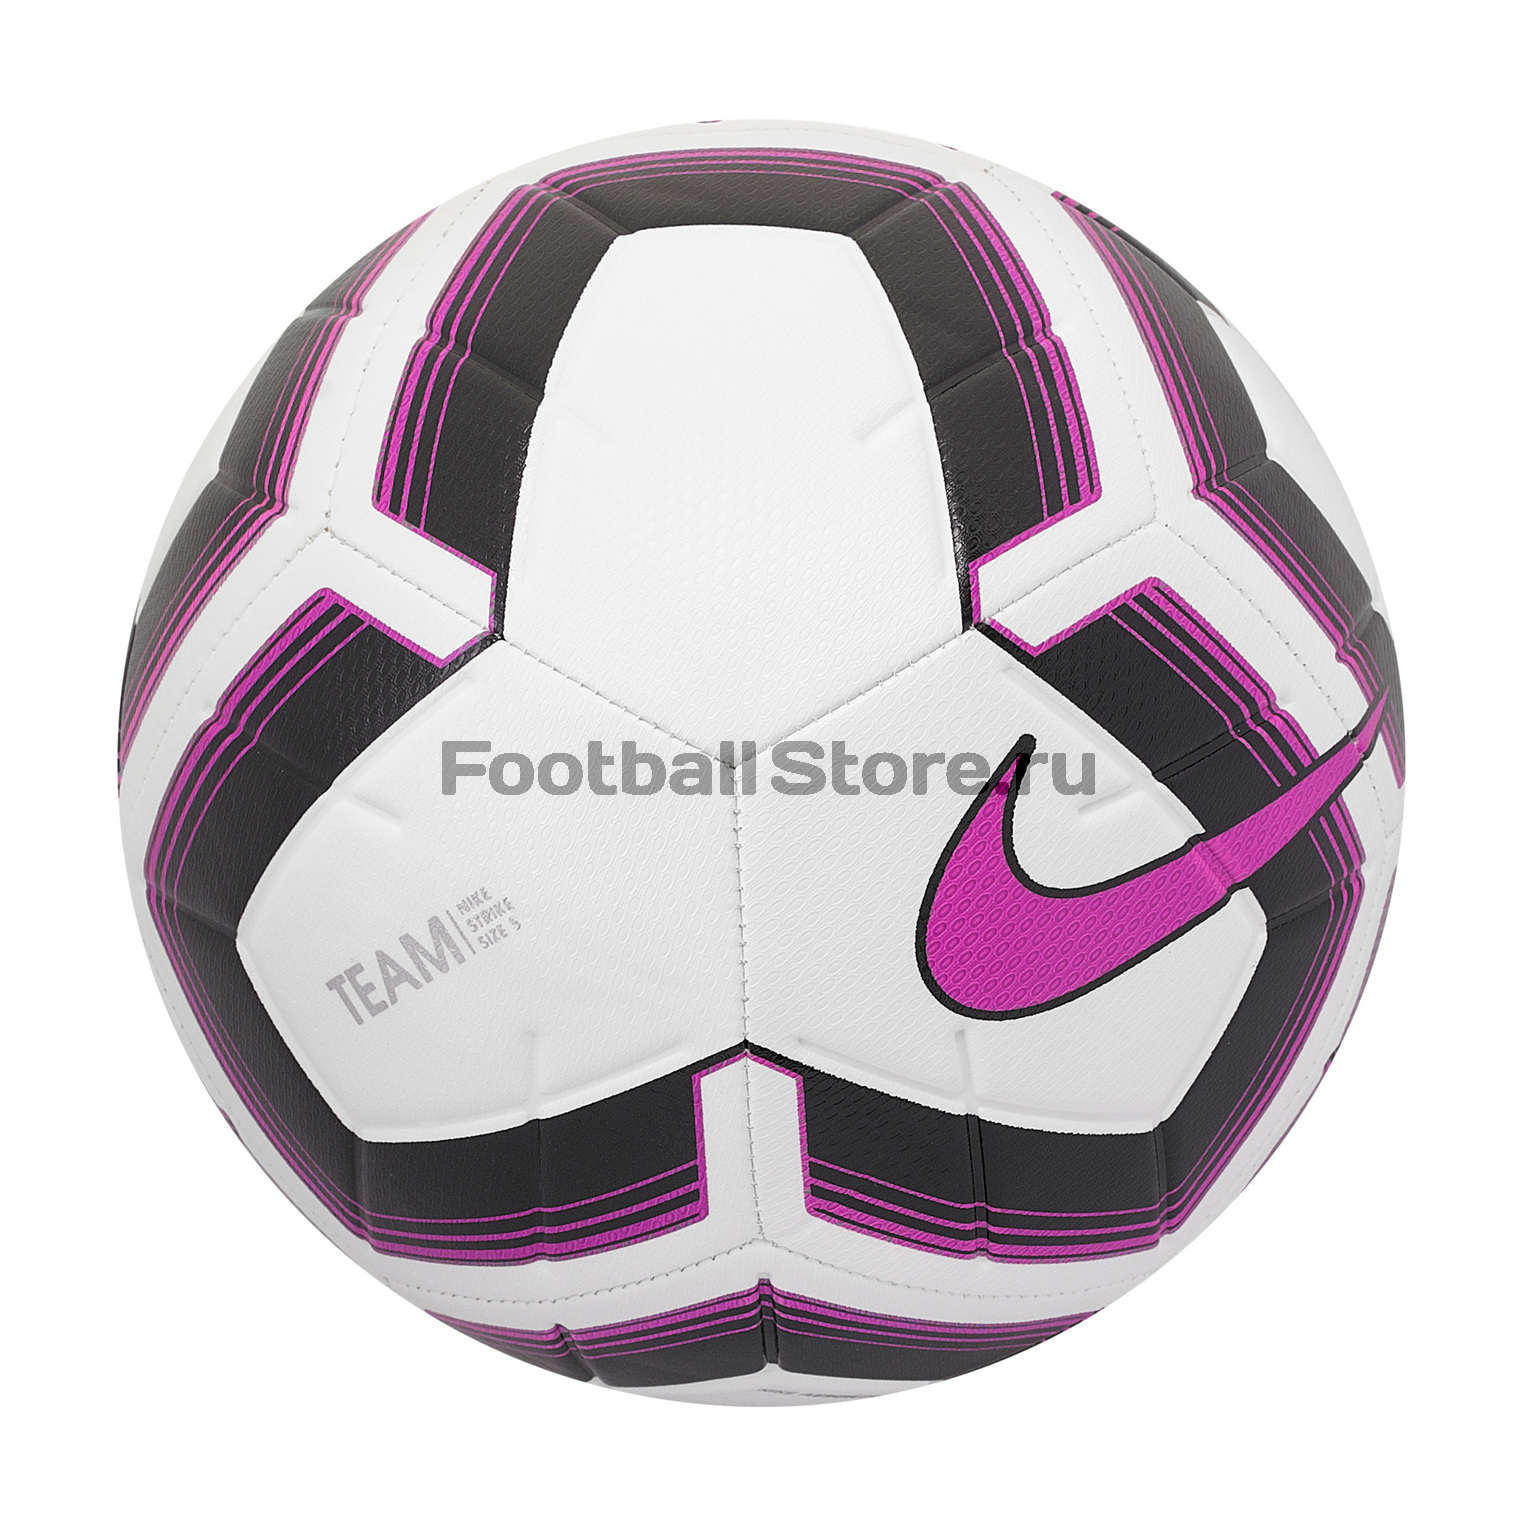 Футбольный мяч Nike Strike Team SC3535-100 футбольный мяч nike nk strike team 290g sc3127 100